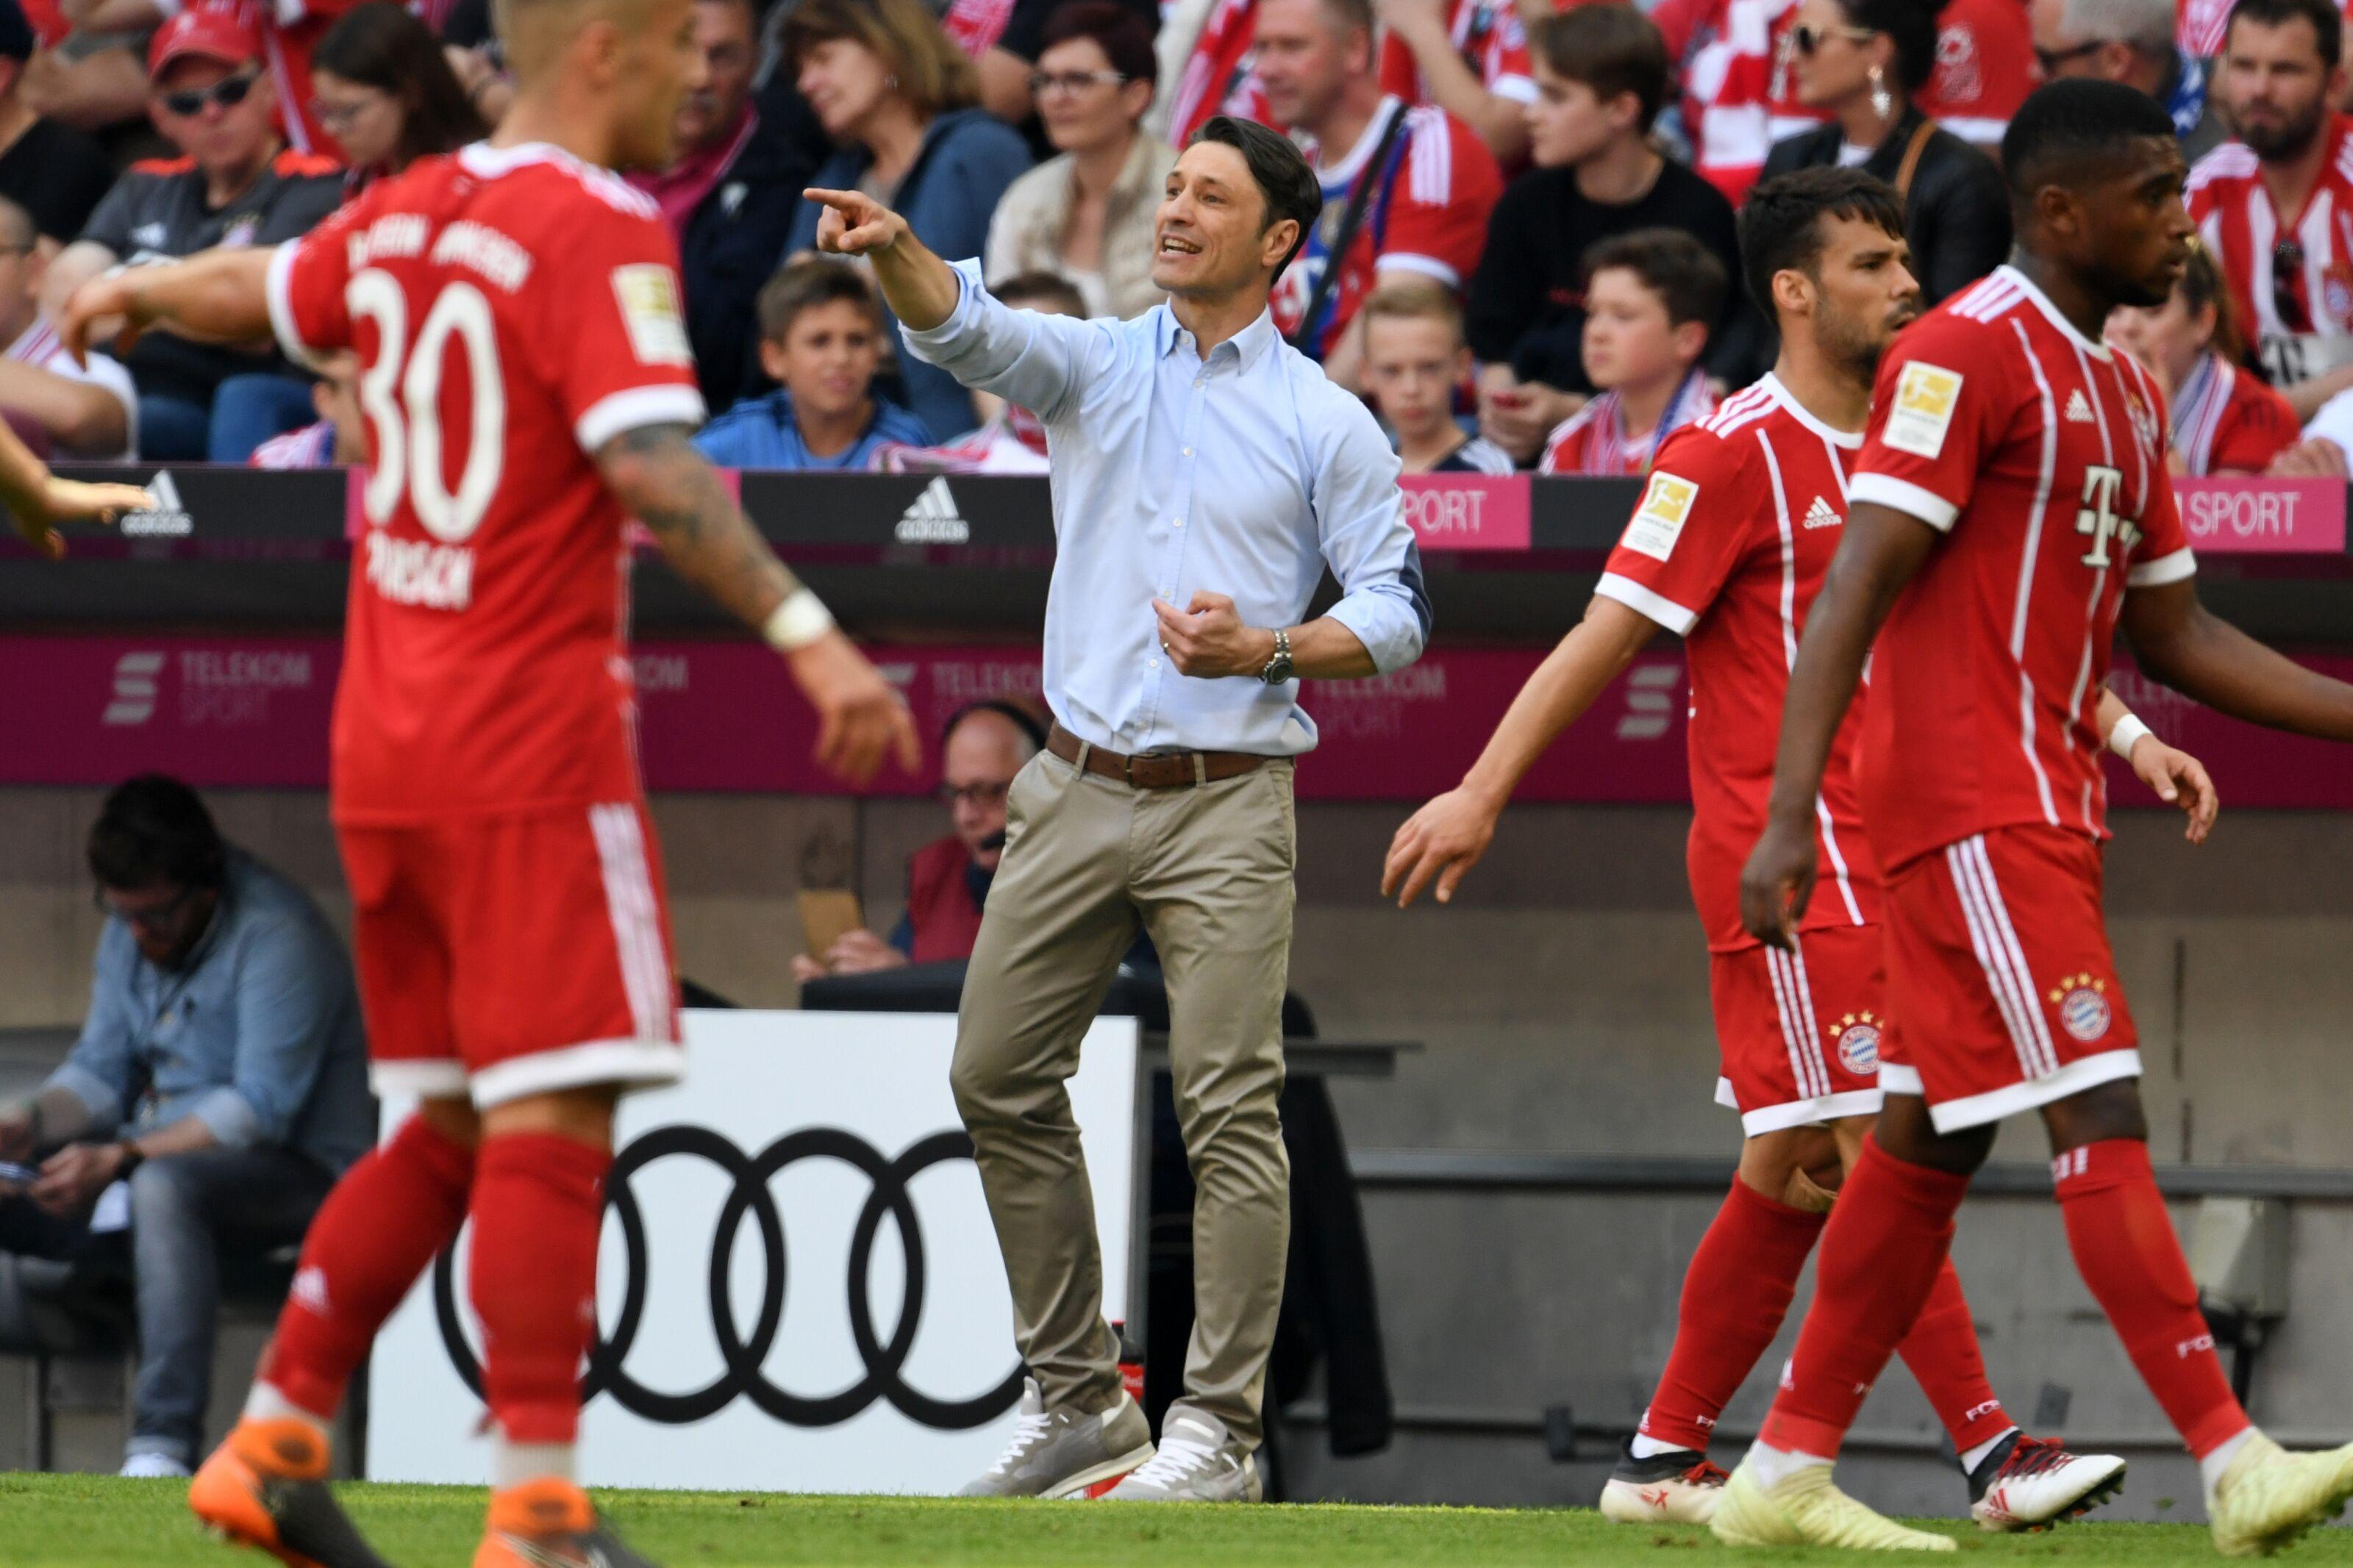 Dfb Pokal Bayern Frankfurt